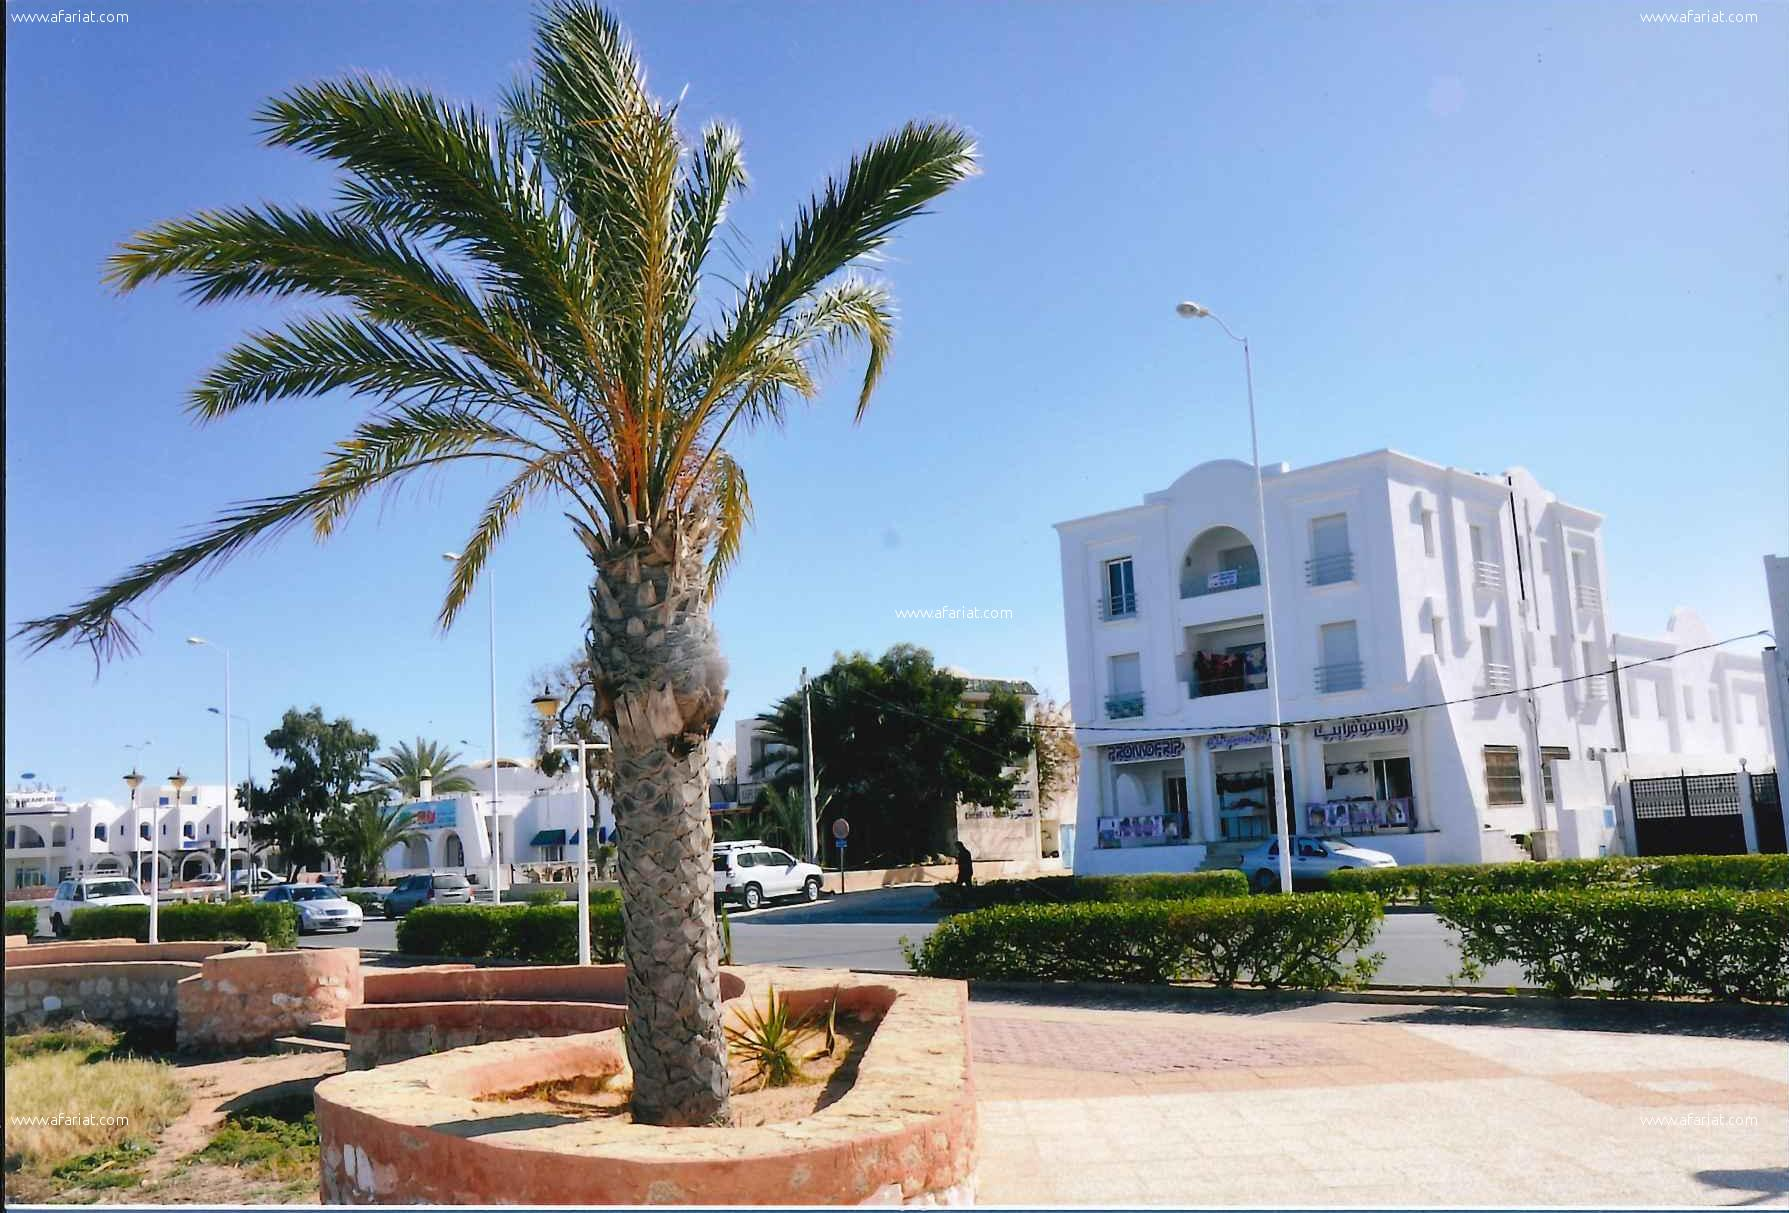 Un immeuble cornche houmtsouk Djerba